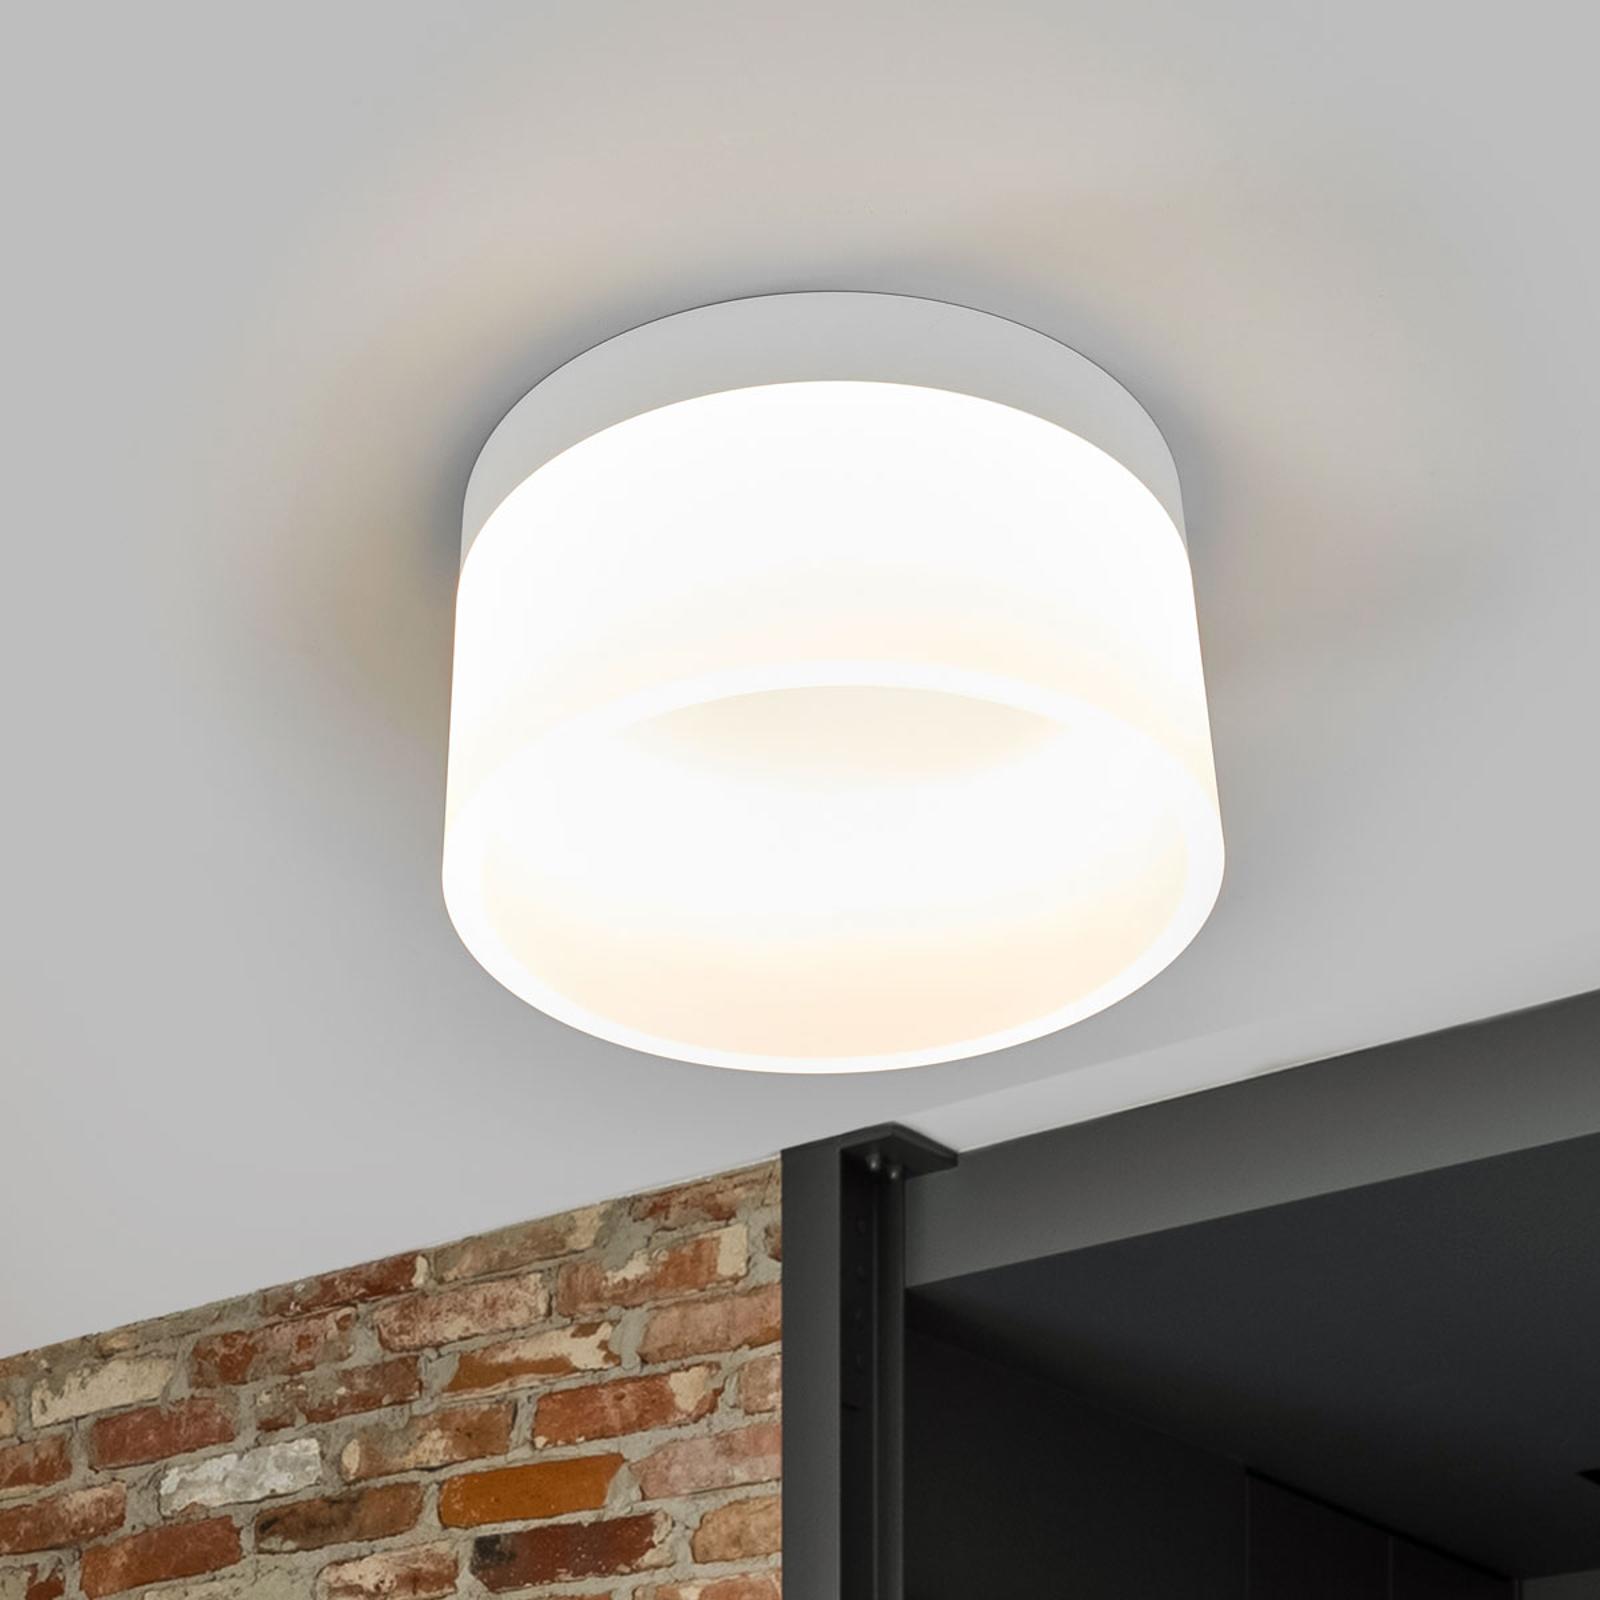 Helestra Liv - LED plafondlamp, 20 cm